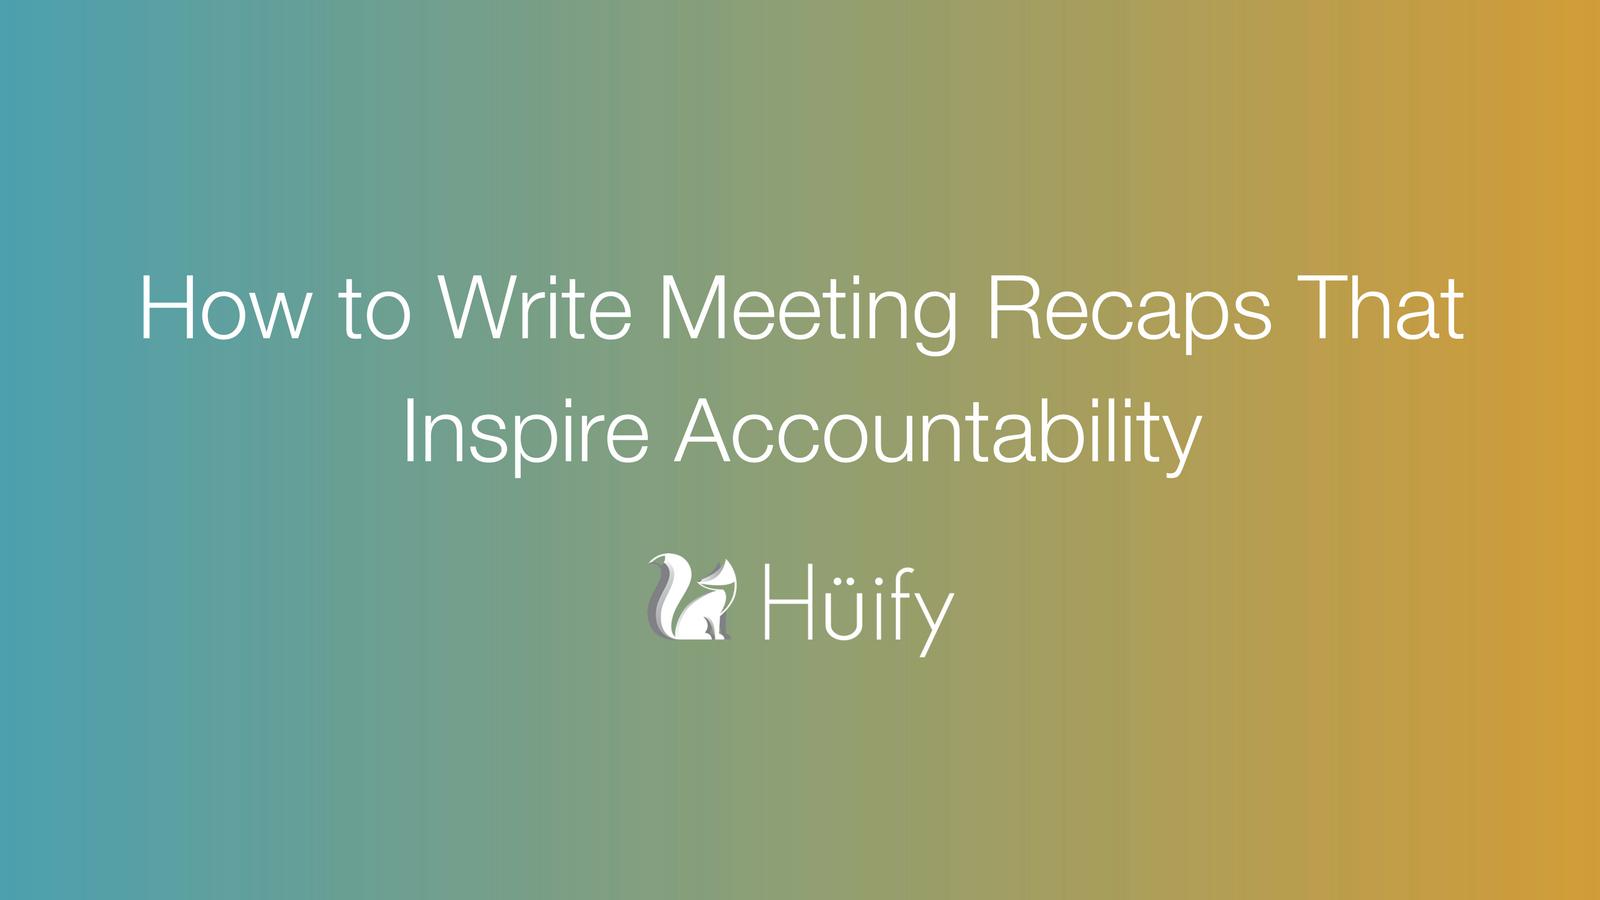 how to write meeting recaps that inspire accountability